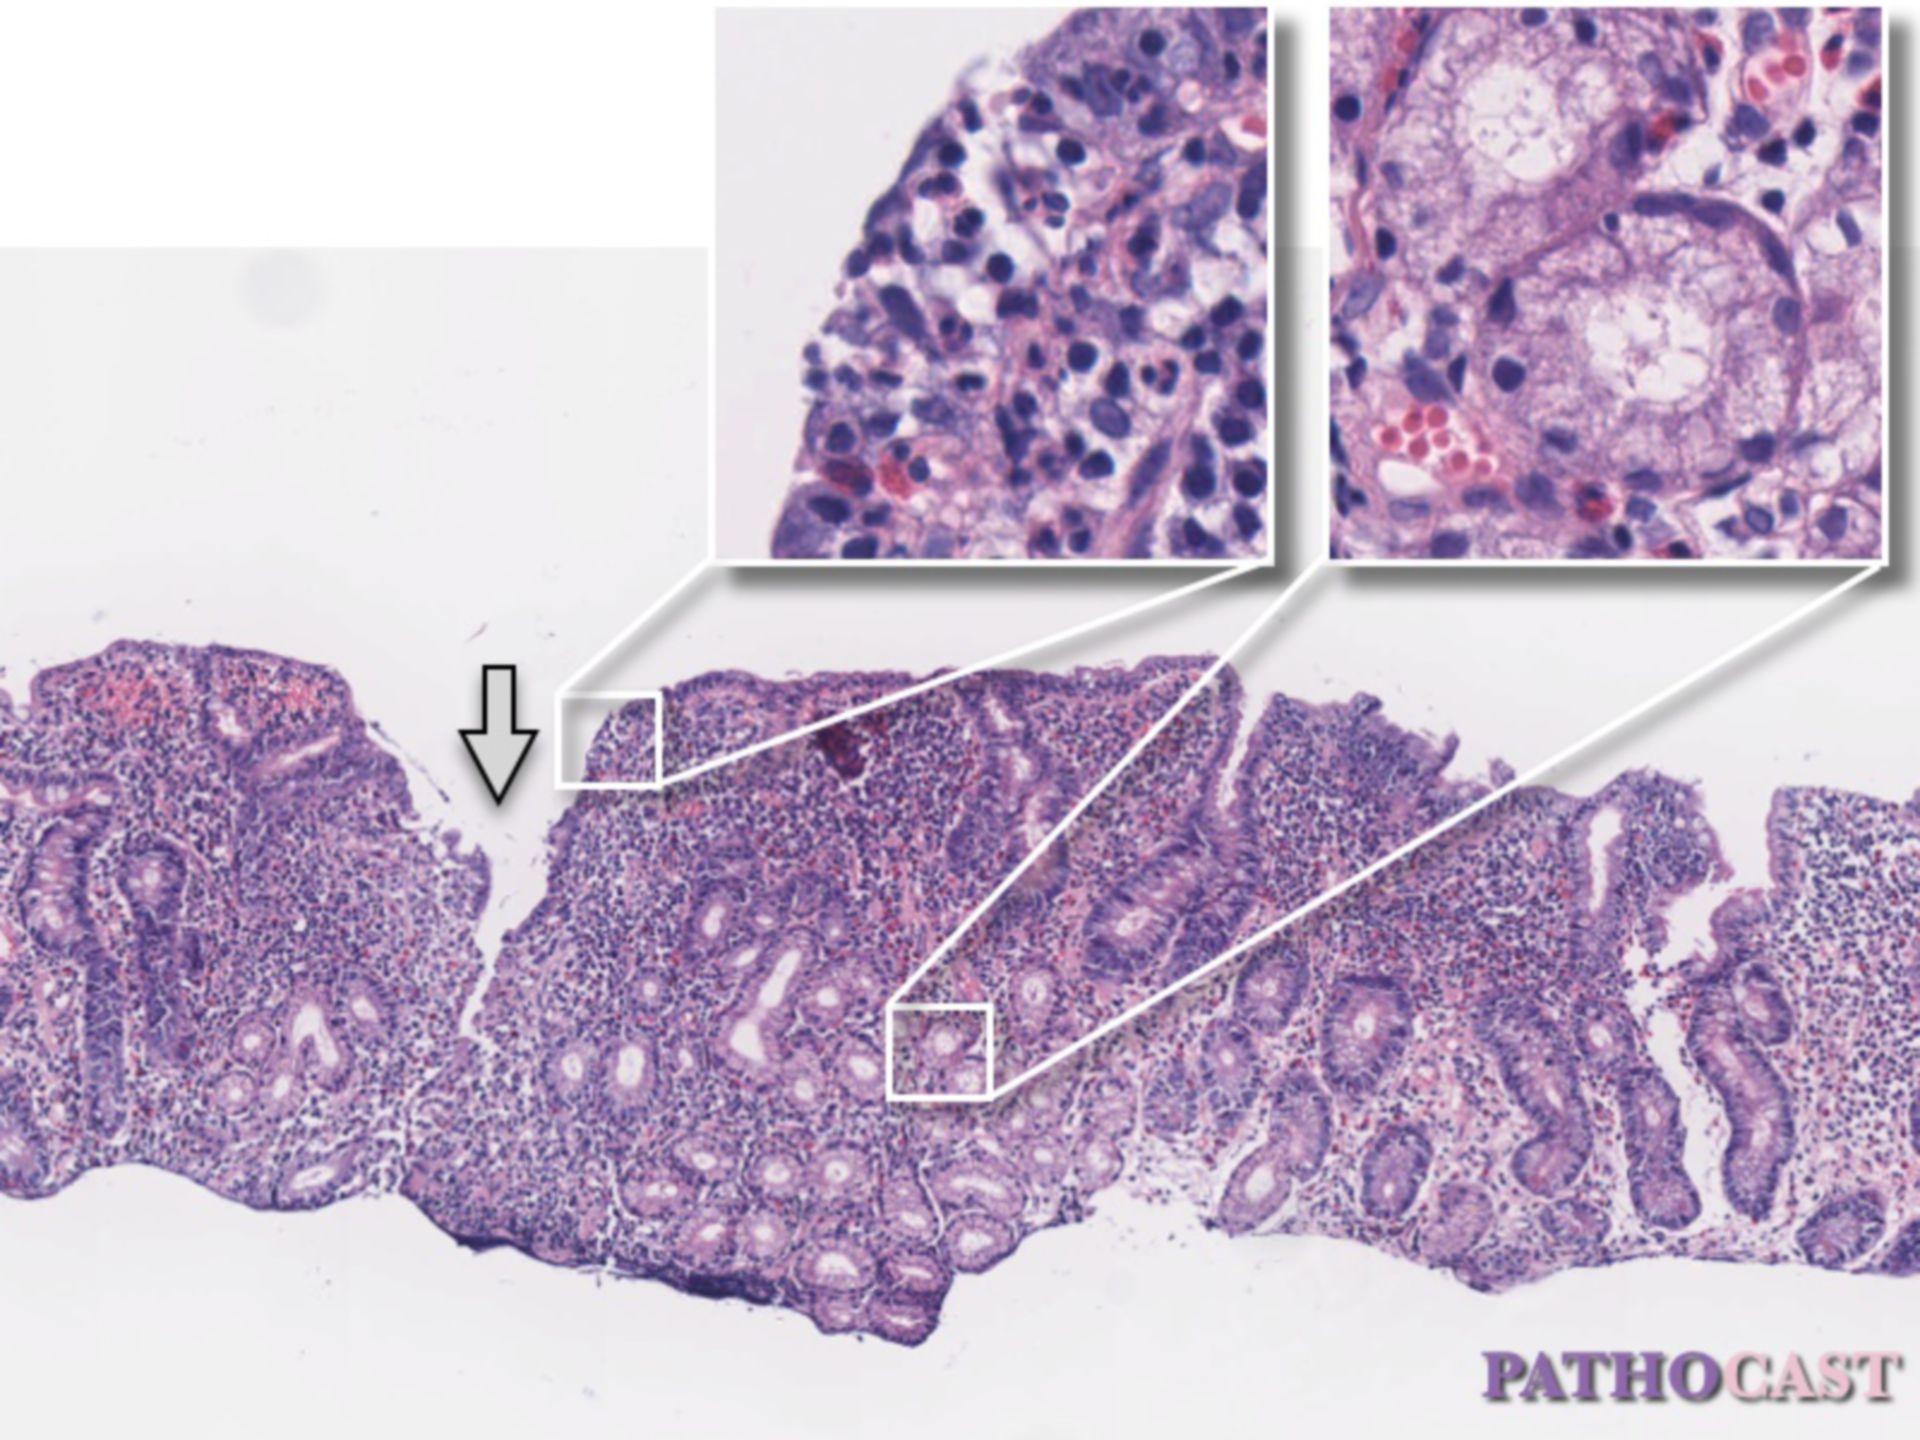 Jejunitis in Crohn's disease